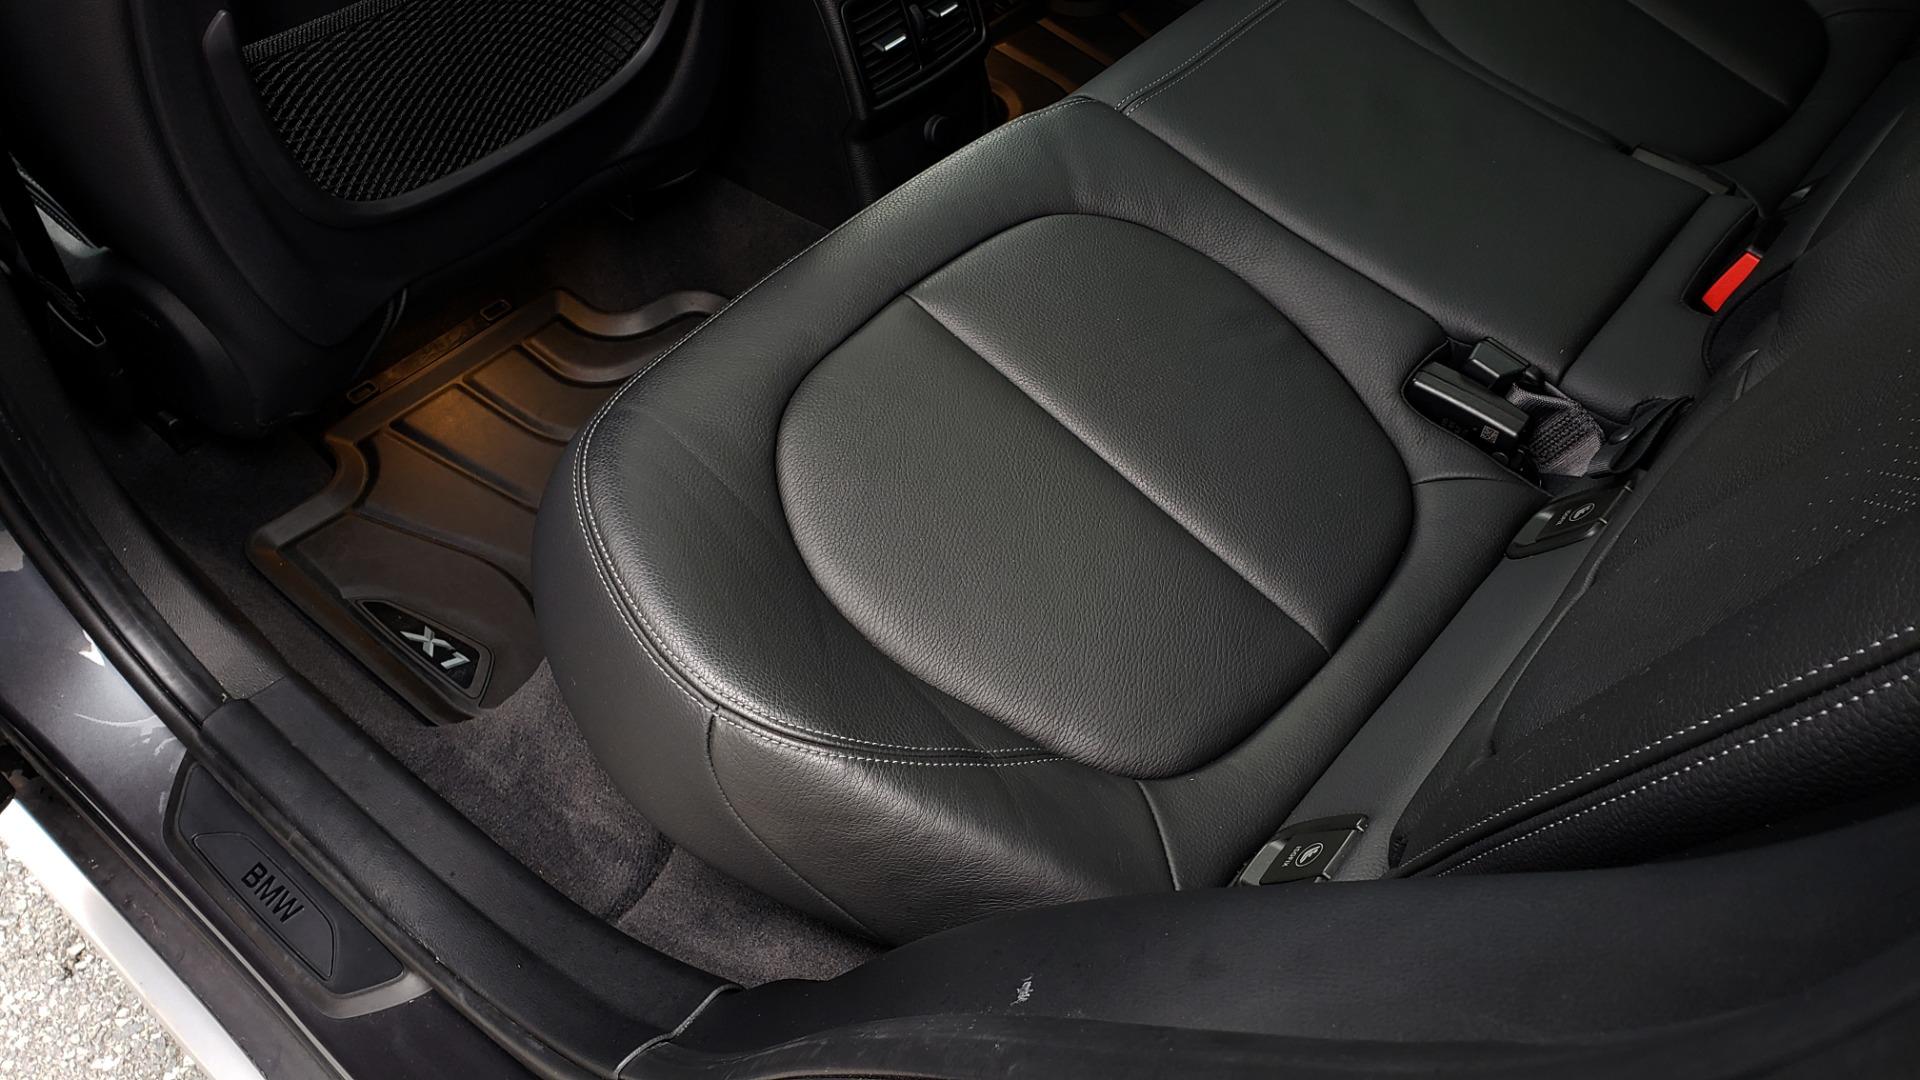 Used 2017 BMW X1 XDRIVE28I / PREM PKG / DRIVER ASST / NAV / CLD WTHR for sale Sold at Formula Imports in Charlotte NC 28227 63